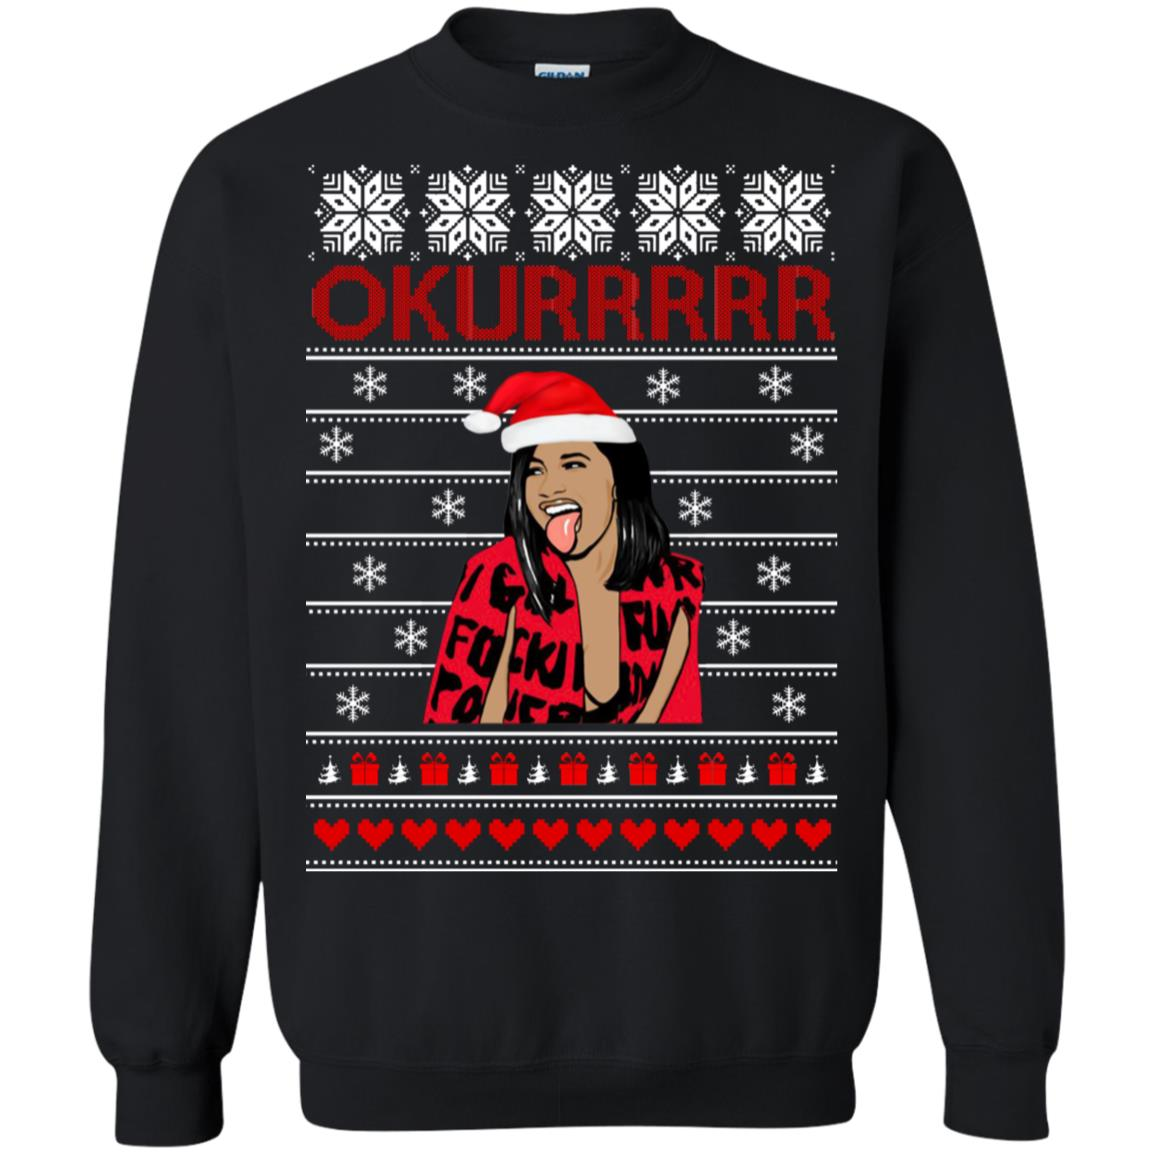 Cardi B Okurrrrr Christmas Sweater T Shirt Long Sleeve Hoodie